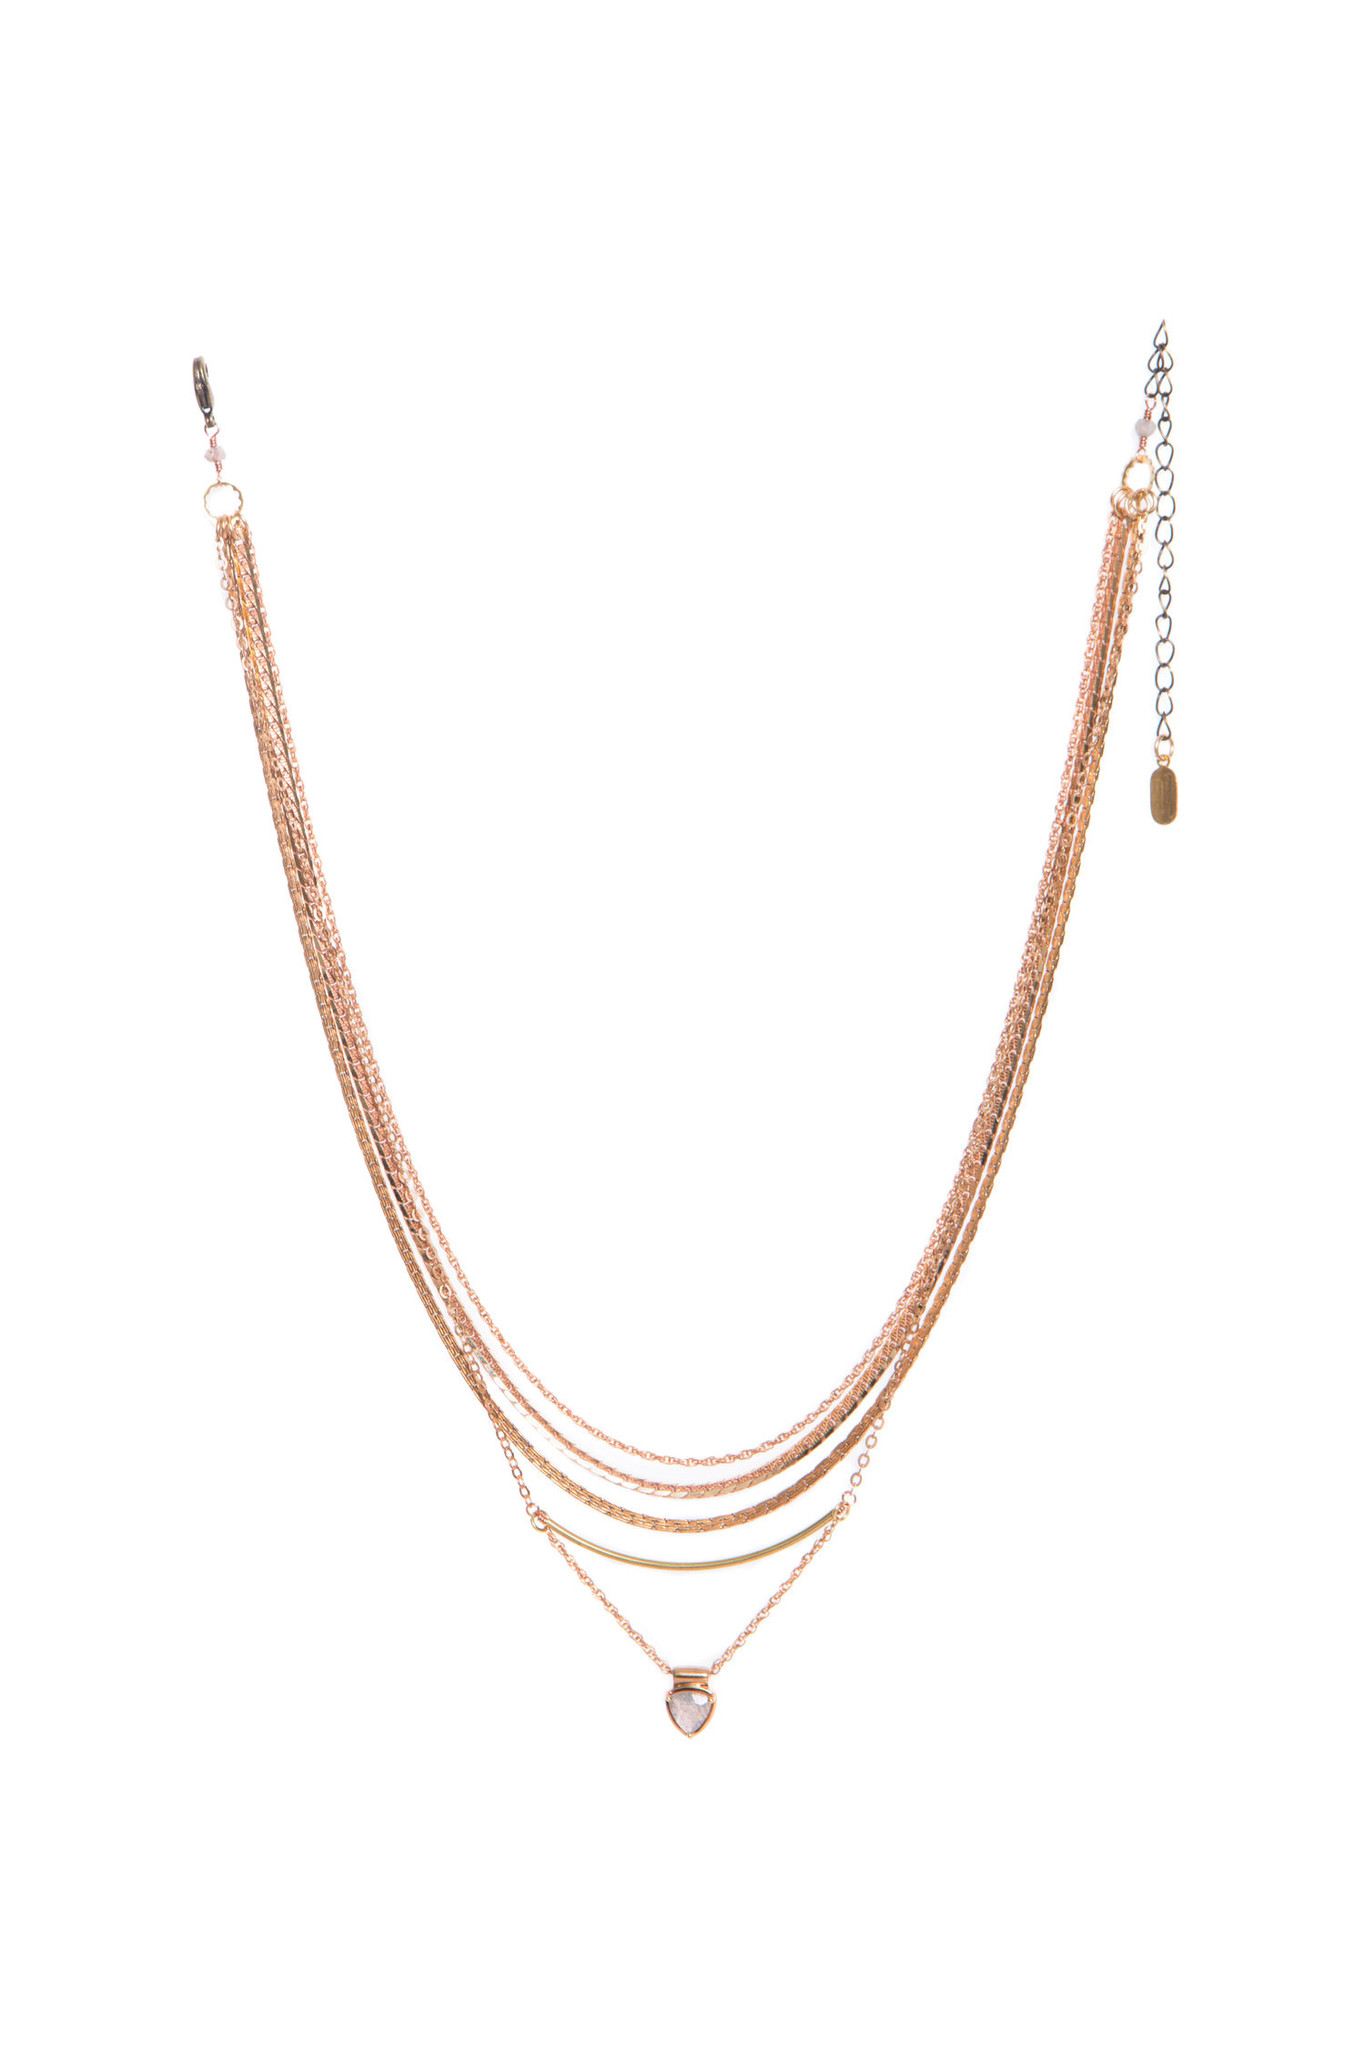 Hailey Gerrits Trillion Necklace- Labradorite